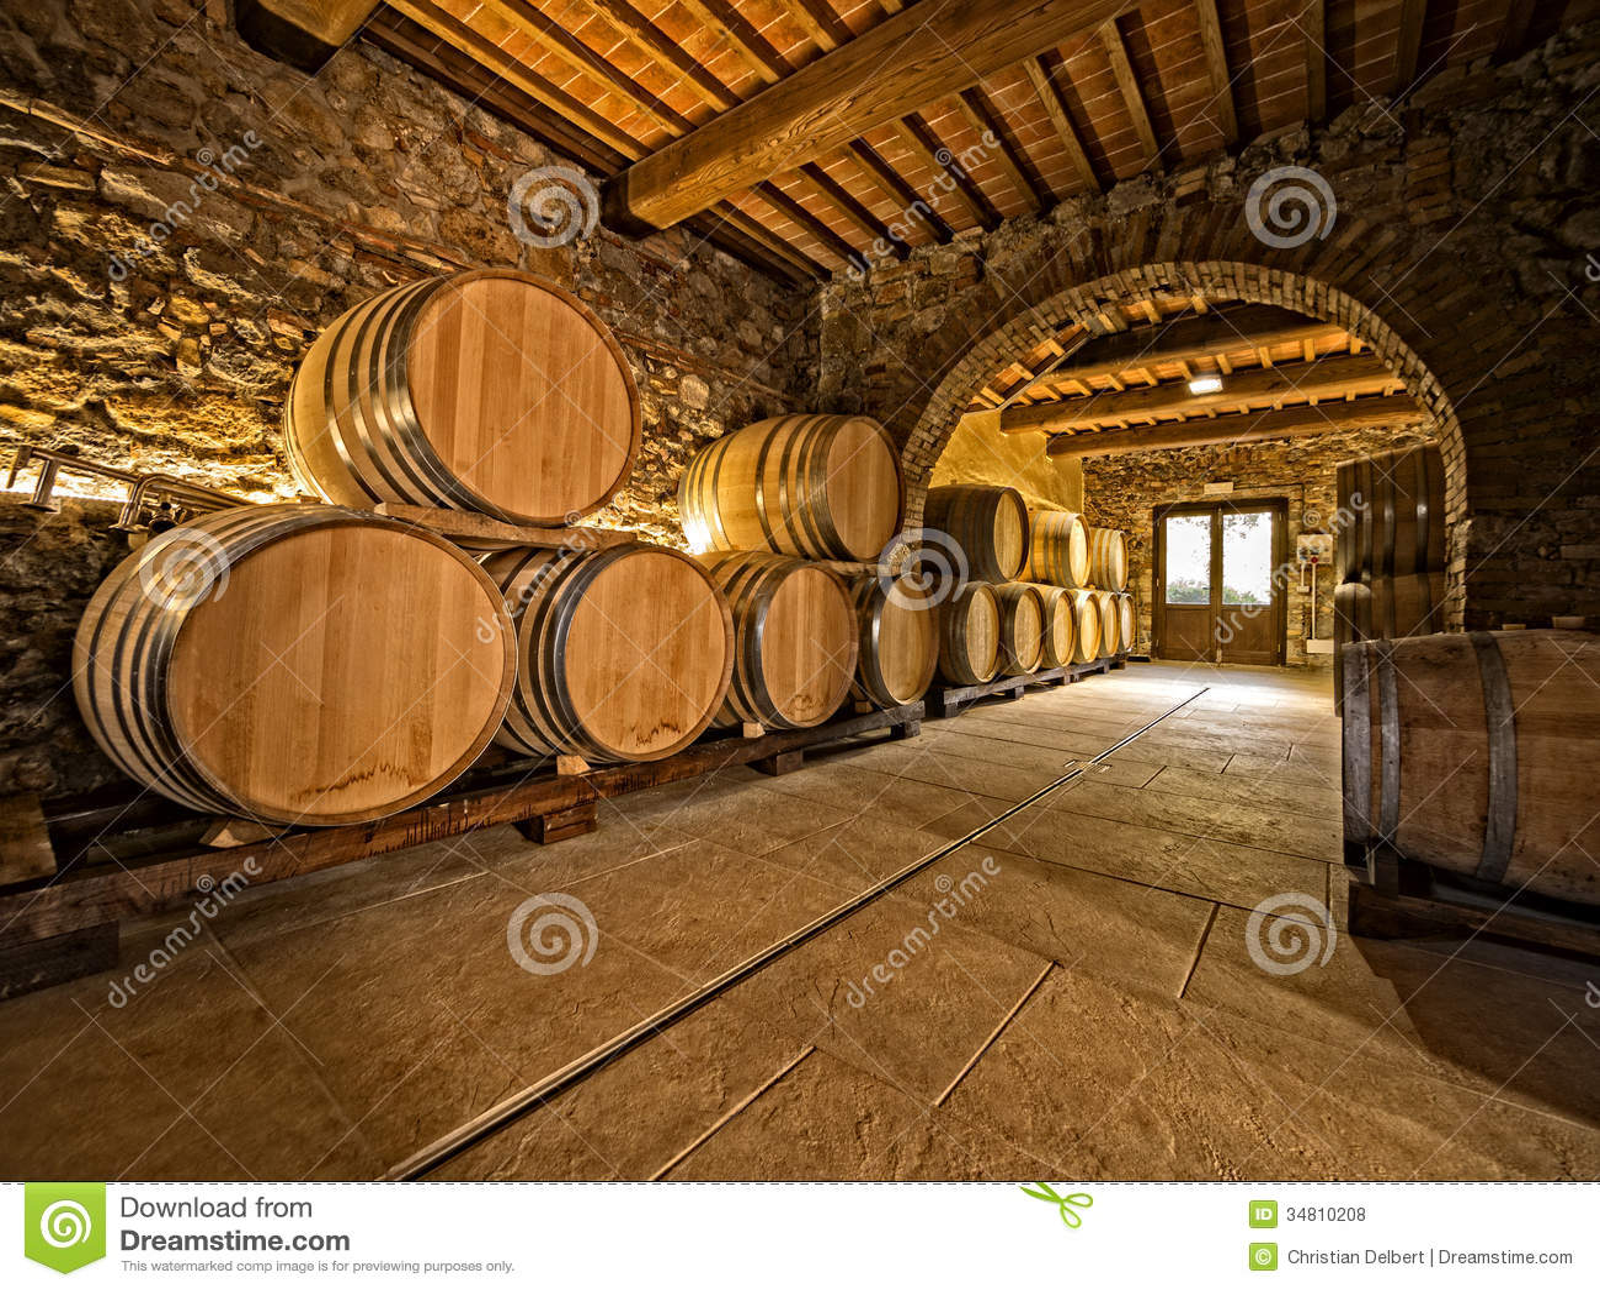 Wine Cellar Barrel Room   Visionary Mural Company   Barrel Wine Cellar